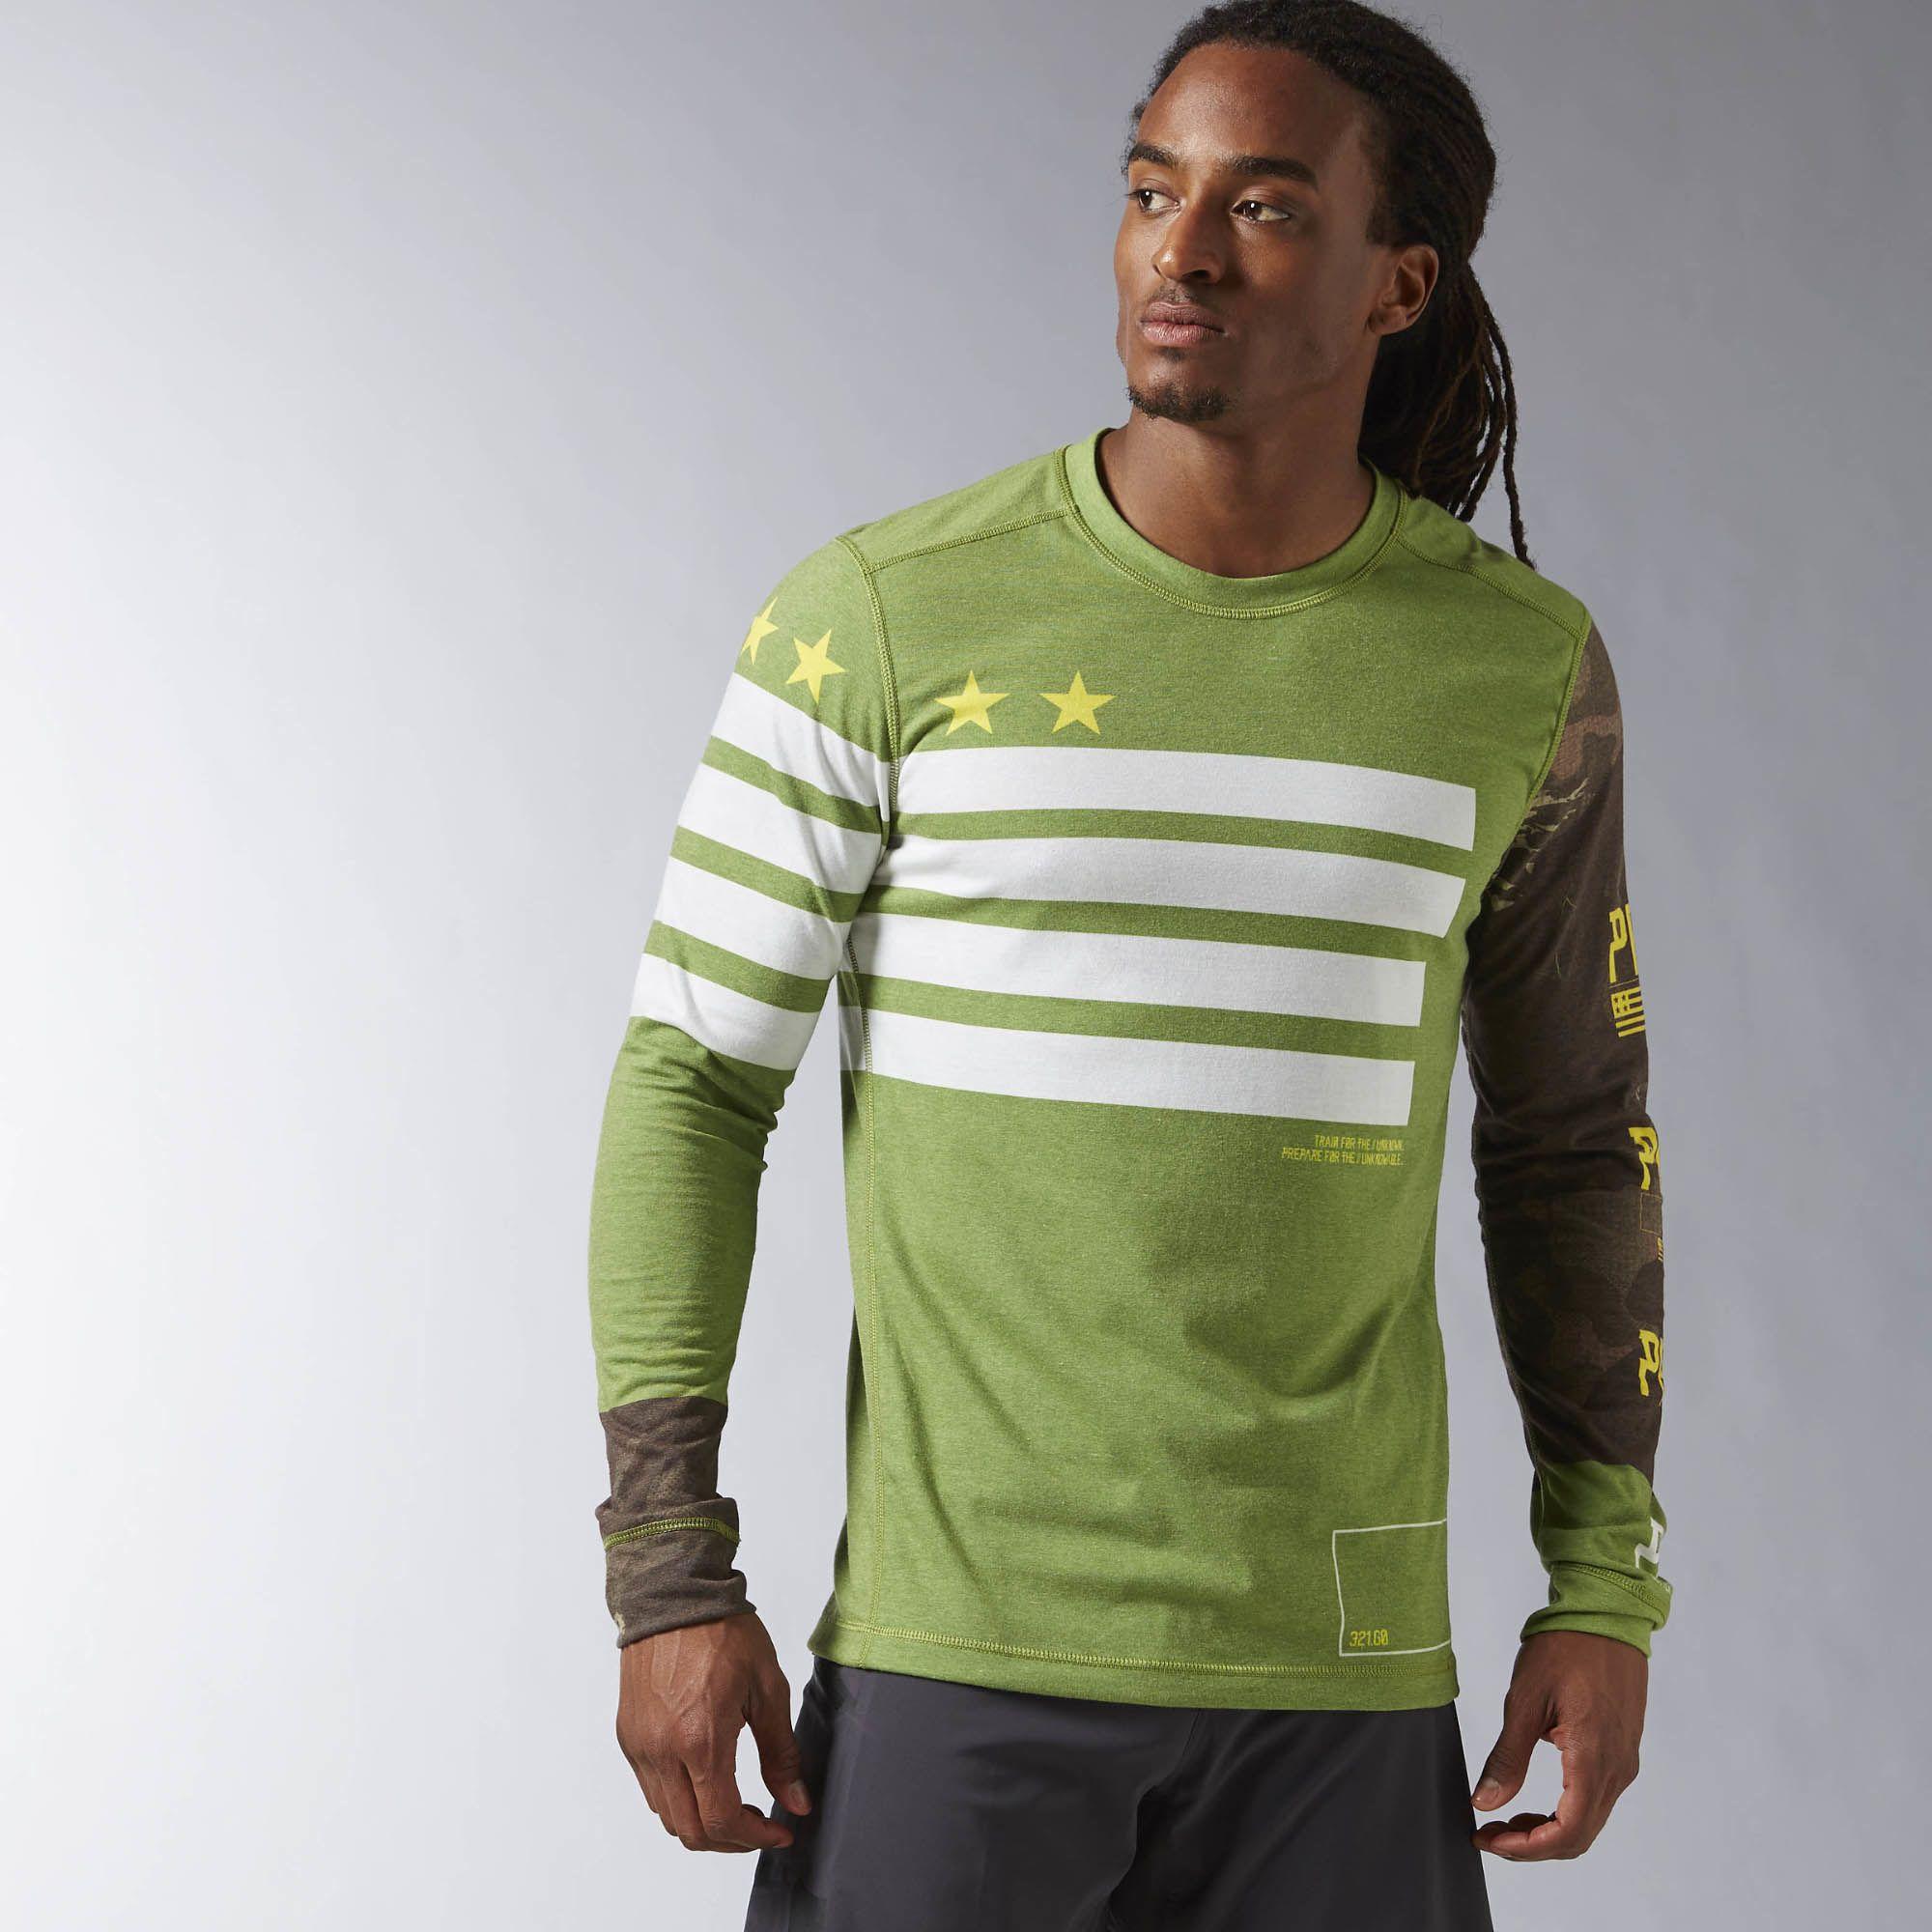 70b7b142 reebok deals, Reebok crossfit long sleeve performance blend tee with ...